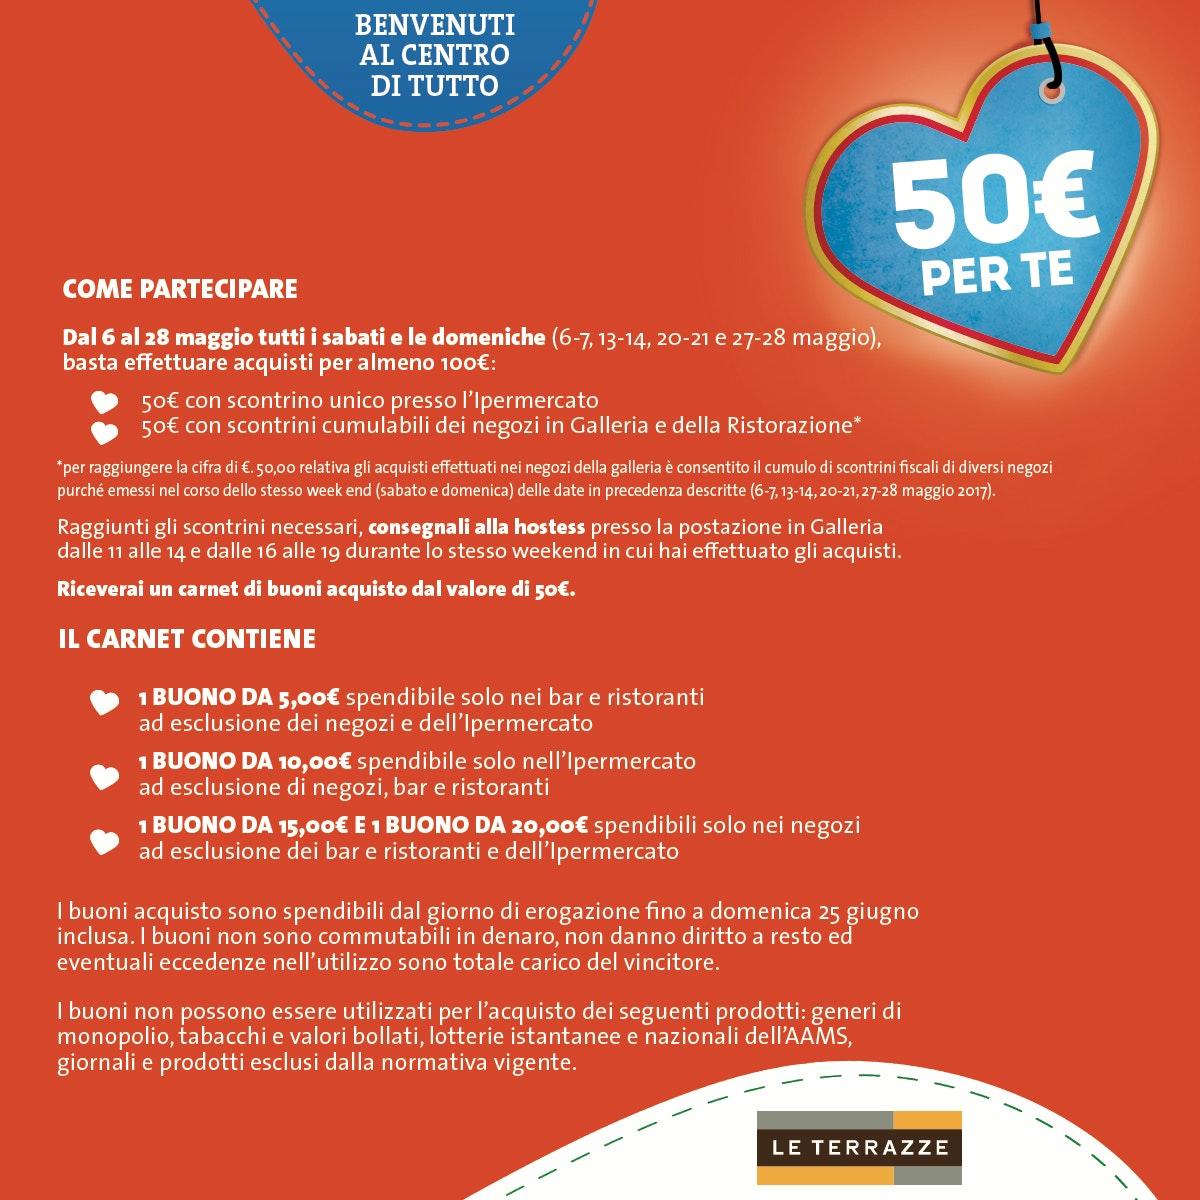 50€ PER TE - Le Terrazze